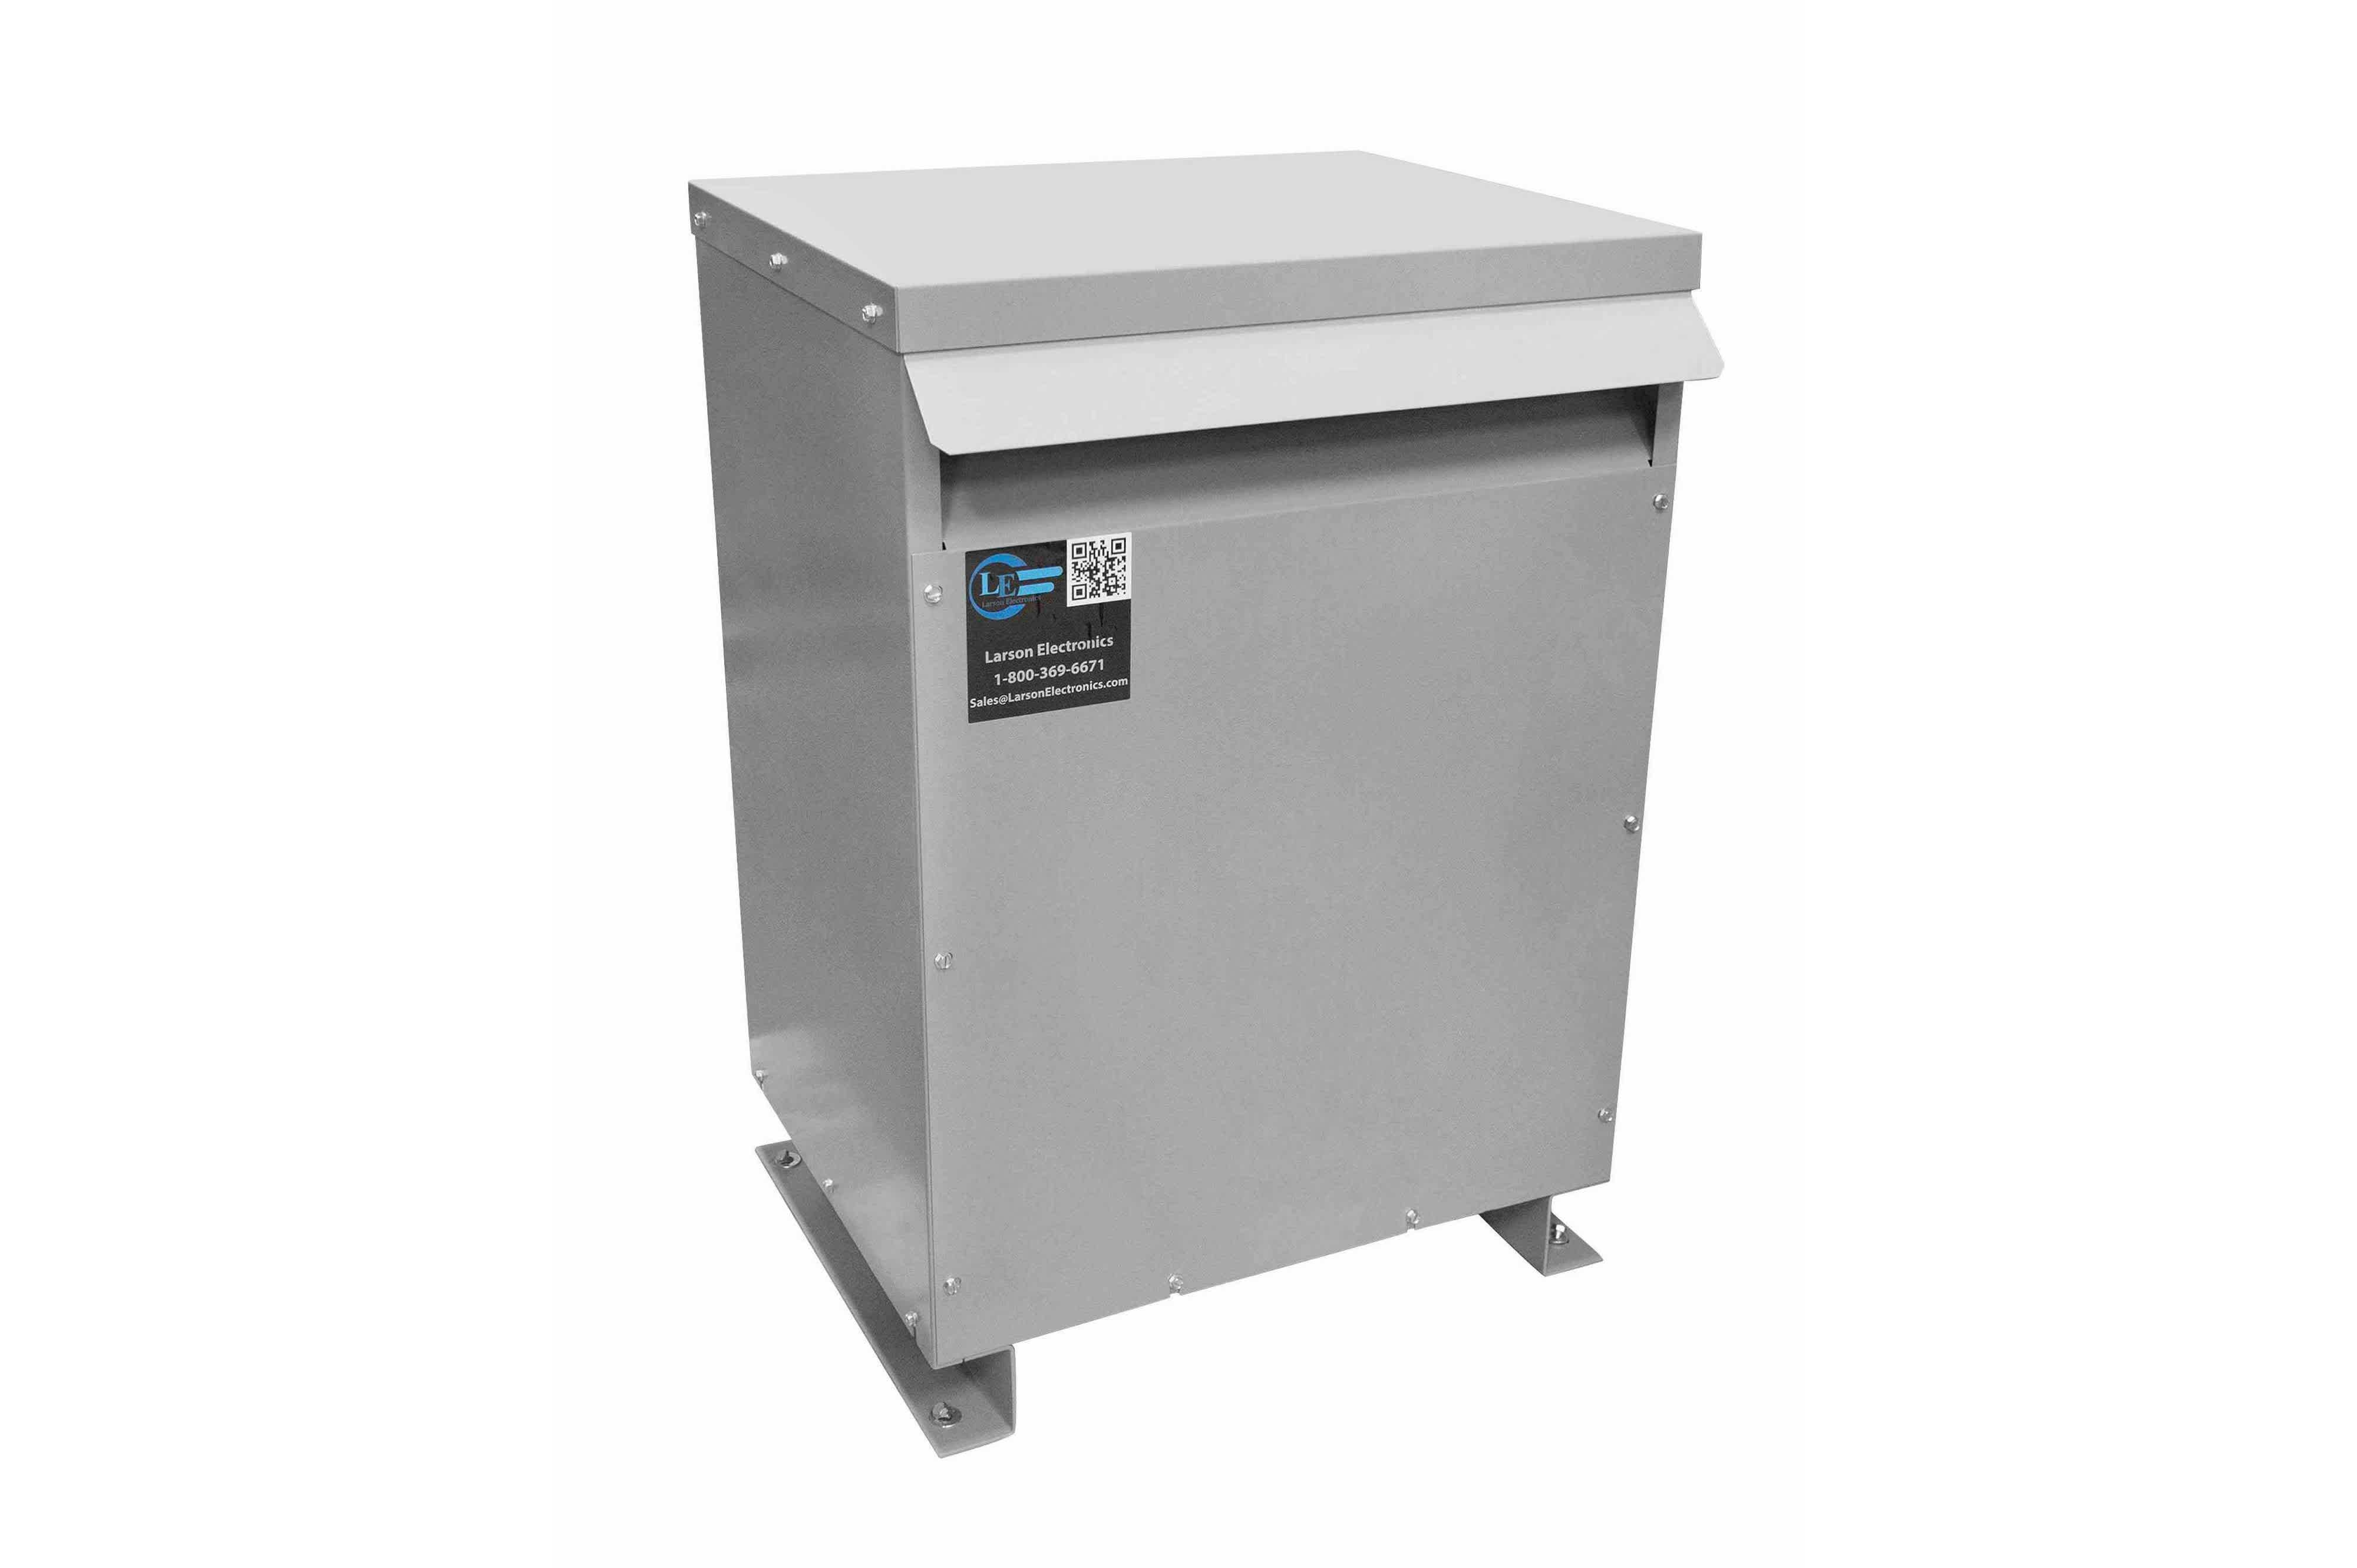 30 kVA 3PH Isolation Transformer, 240V Wye Primary, 415Y/240 Wye-N Secondary, N3R, Ventilated, 60 Hz